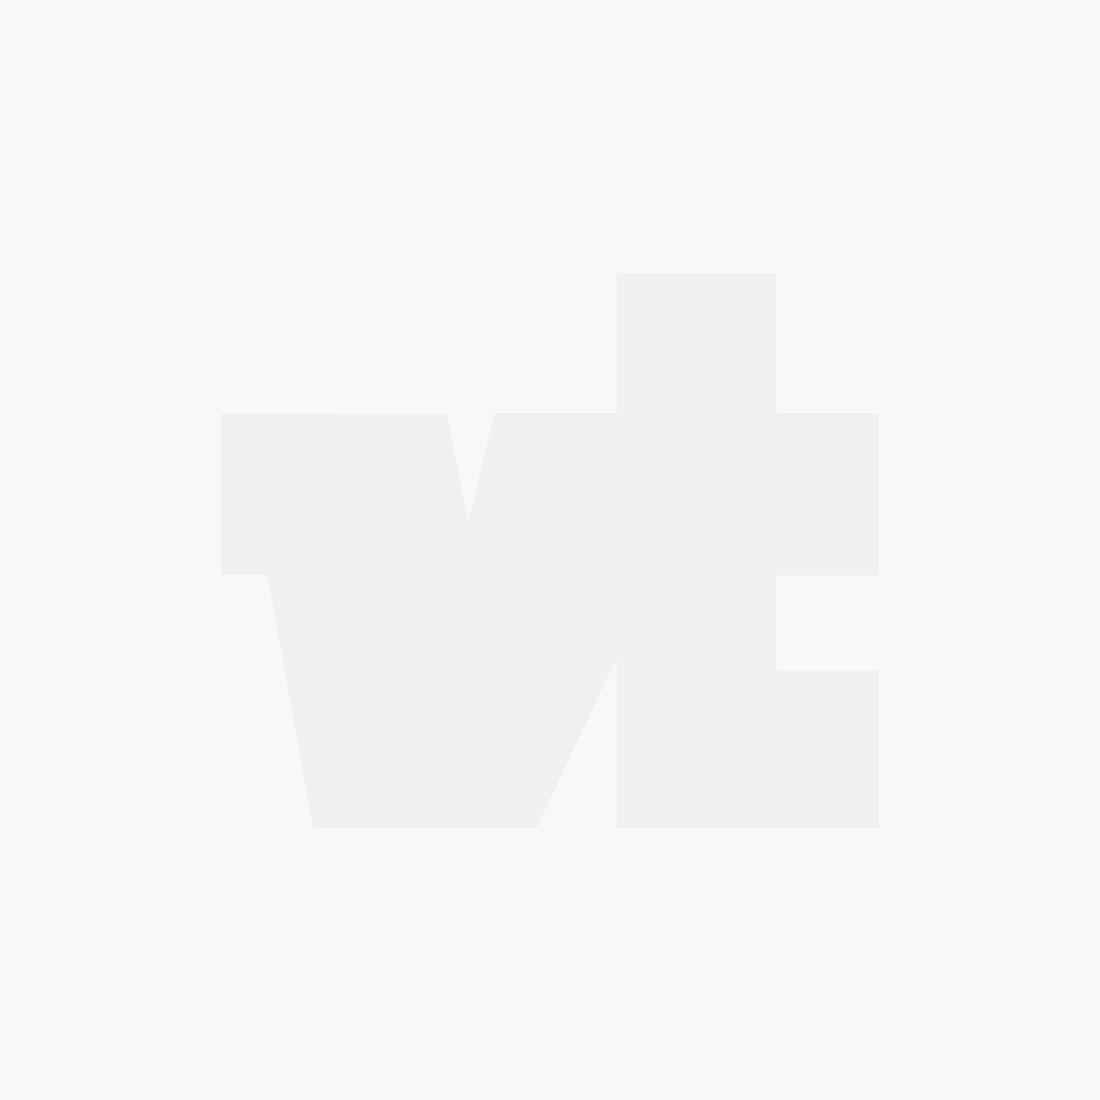 Barrett stripe tee ss crew neck rubber/relaxed